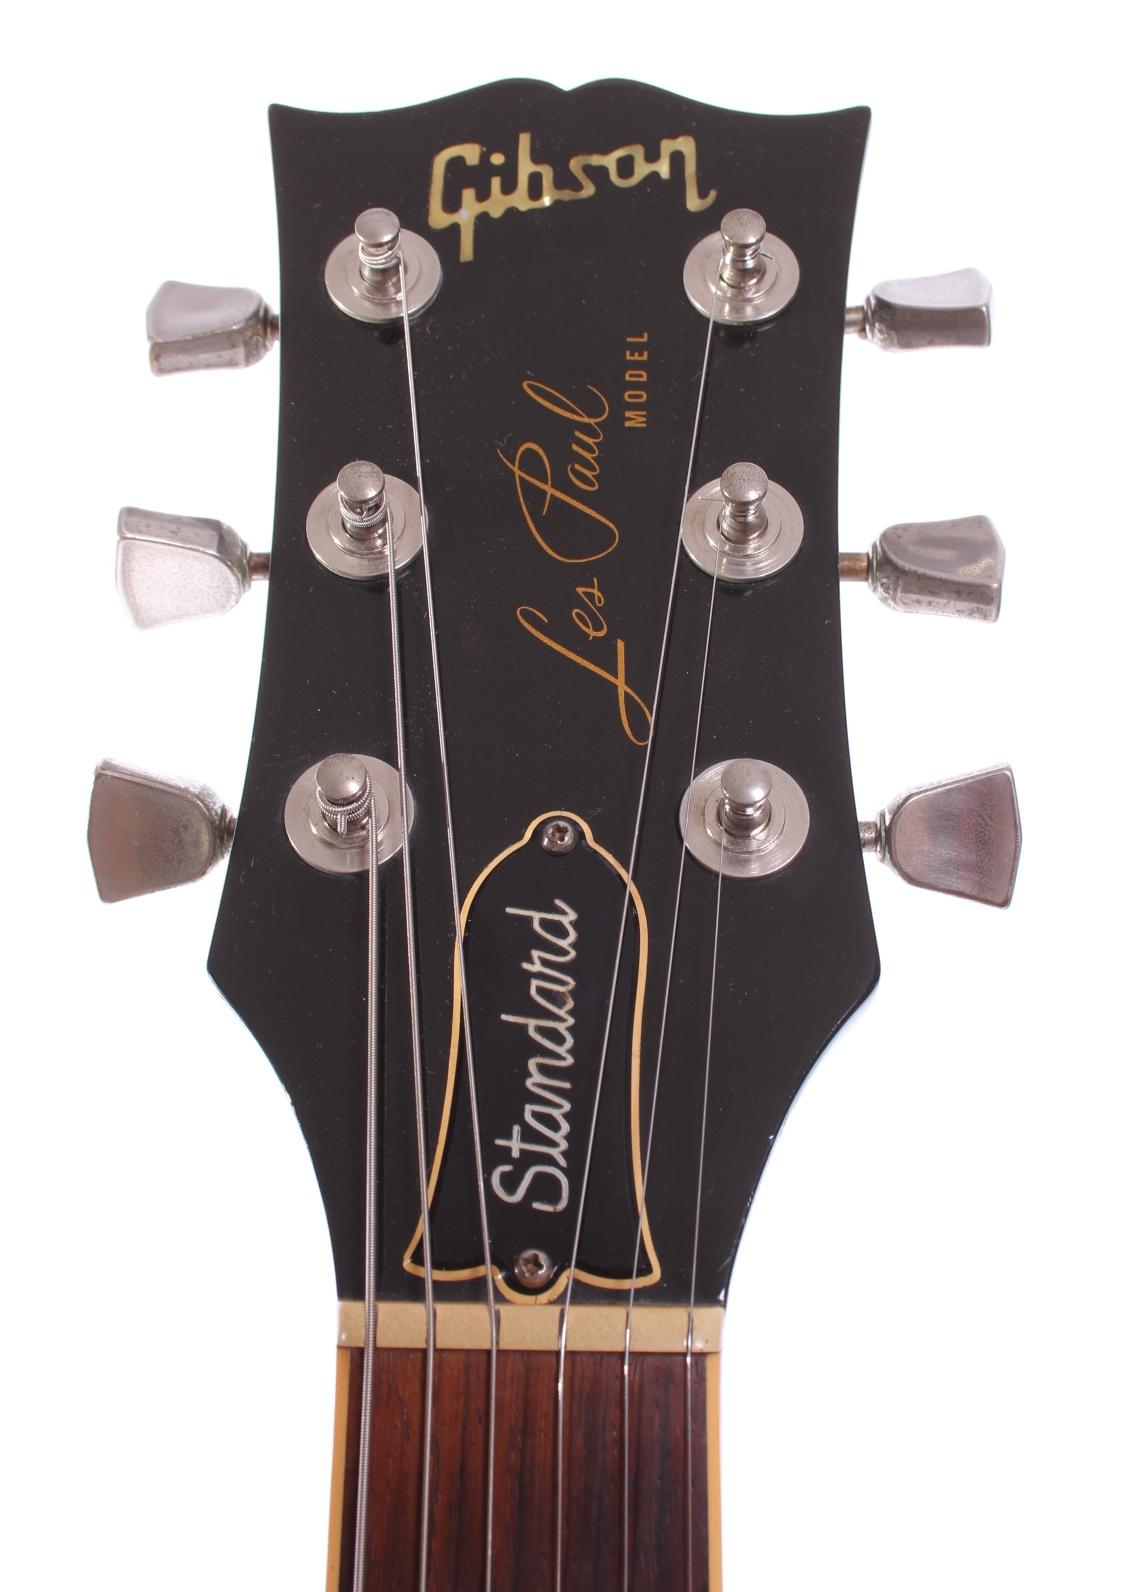 gibson les paul standard 1980 ebony guitar for sale yeahman 39 s guitars. Black Bedroom Furniture Sets. Home Design Ideas